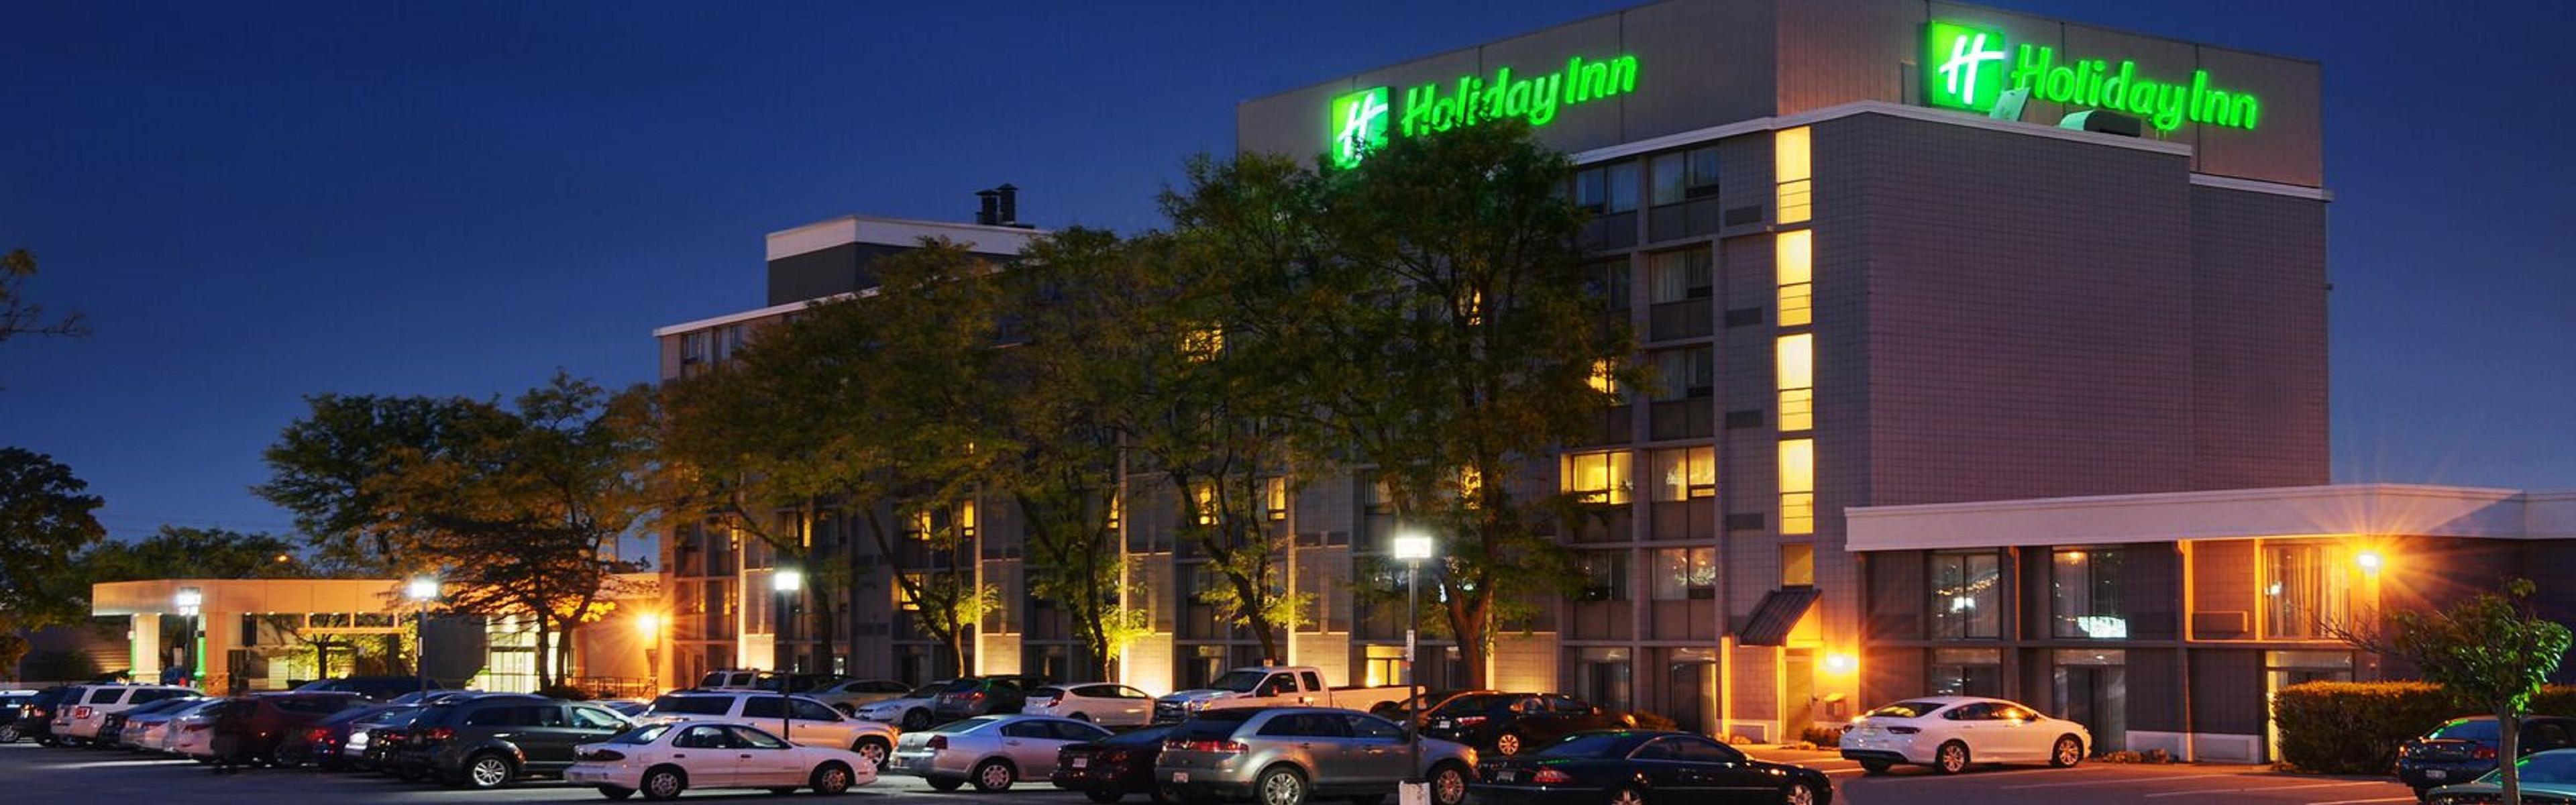 Holiday Inn Burlington Hotel